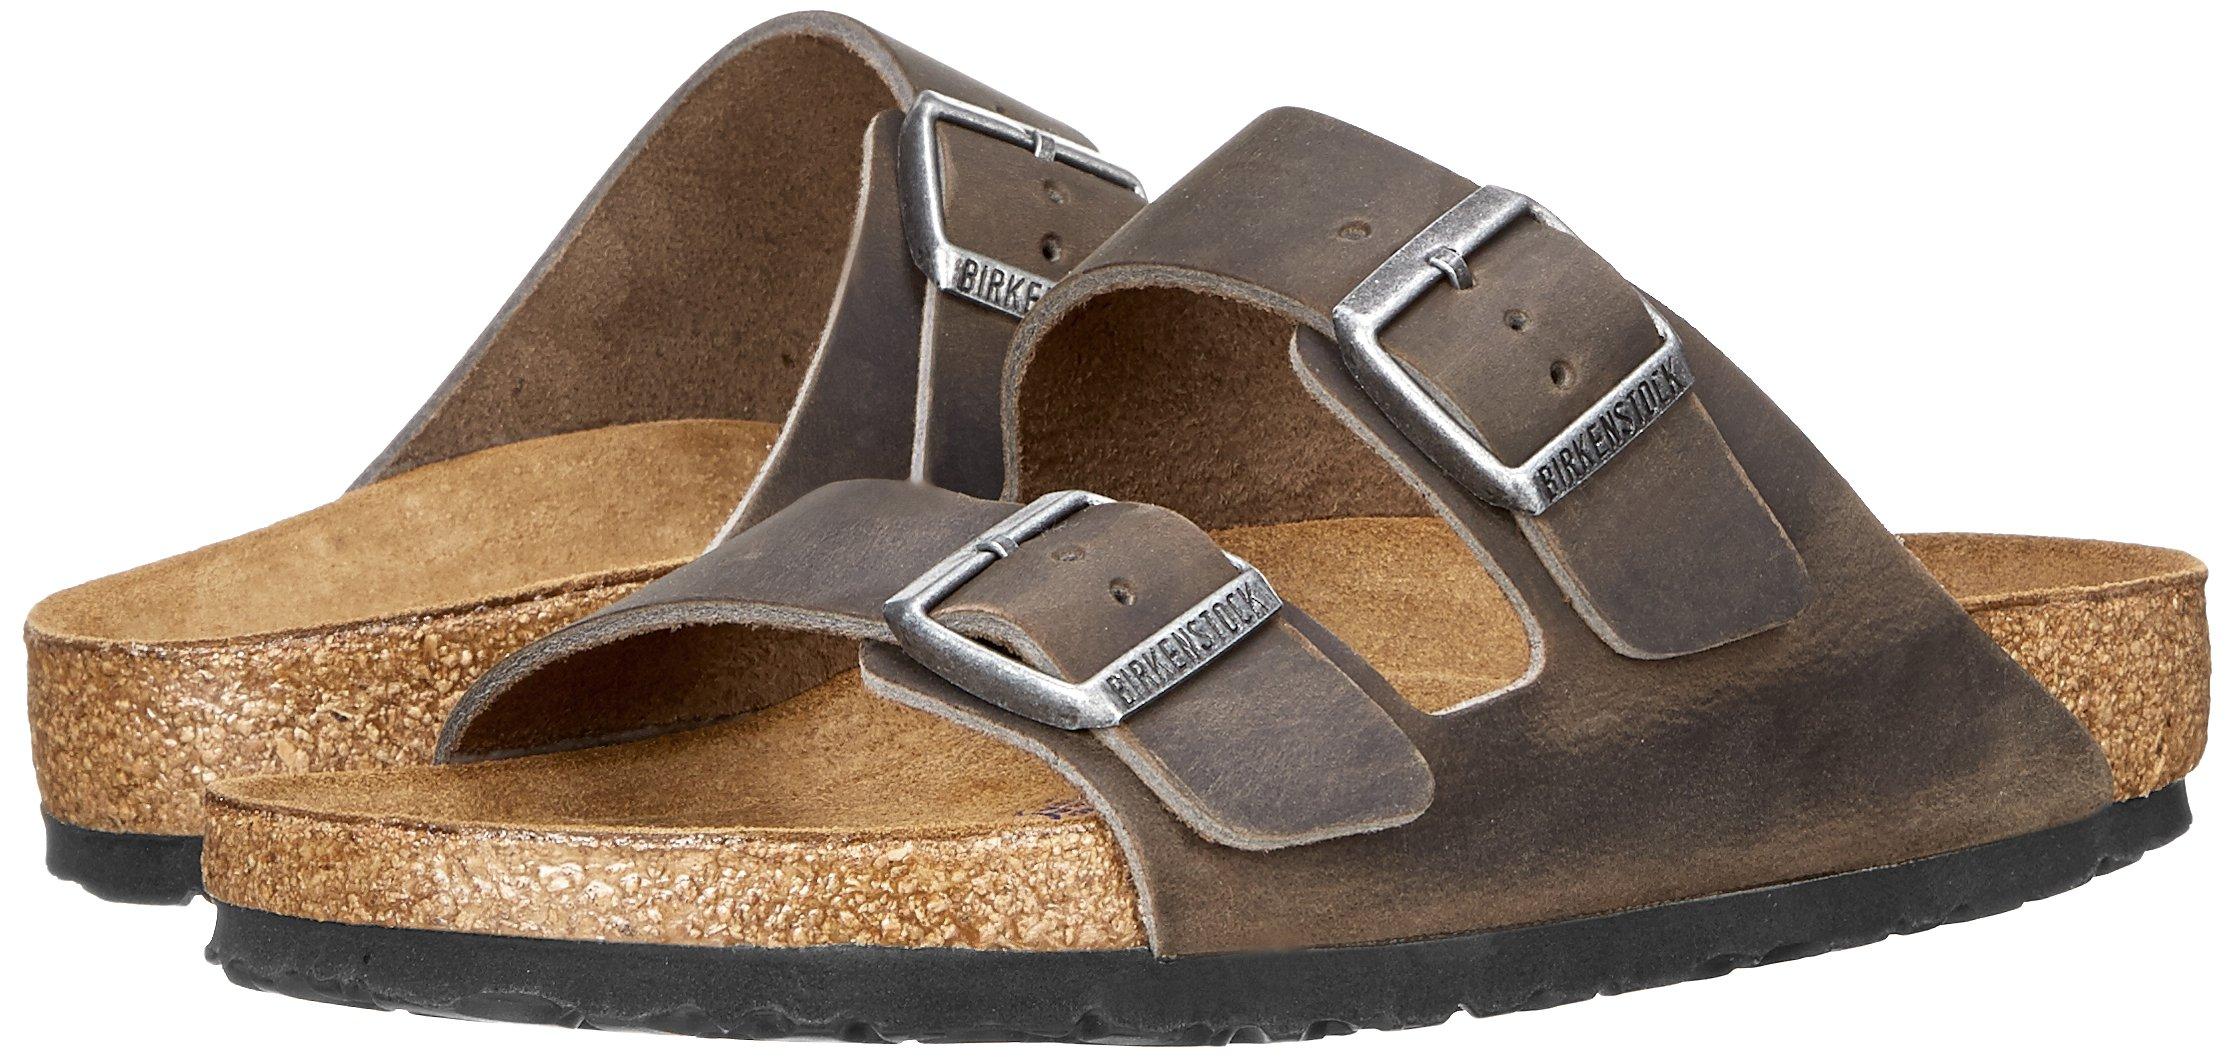 Birkenstock Unisex Arizona Iron Oiled Leather Sandals - 45 M EU/12-12.5 B(M) US Men by Birkenstock (Image #6)